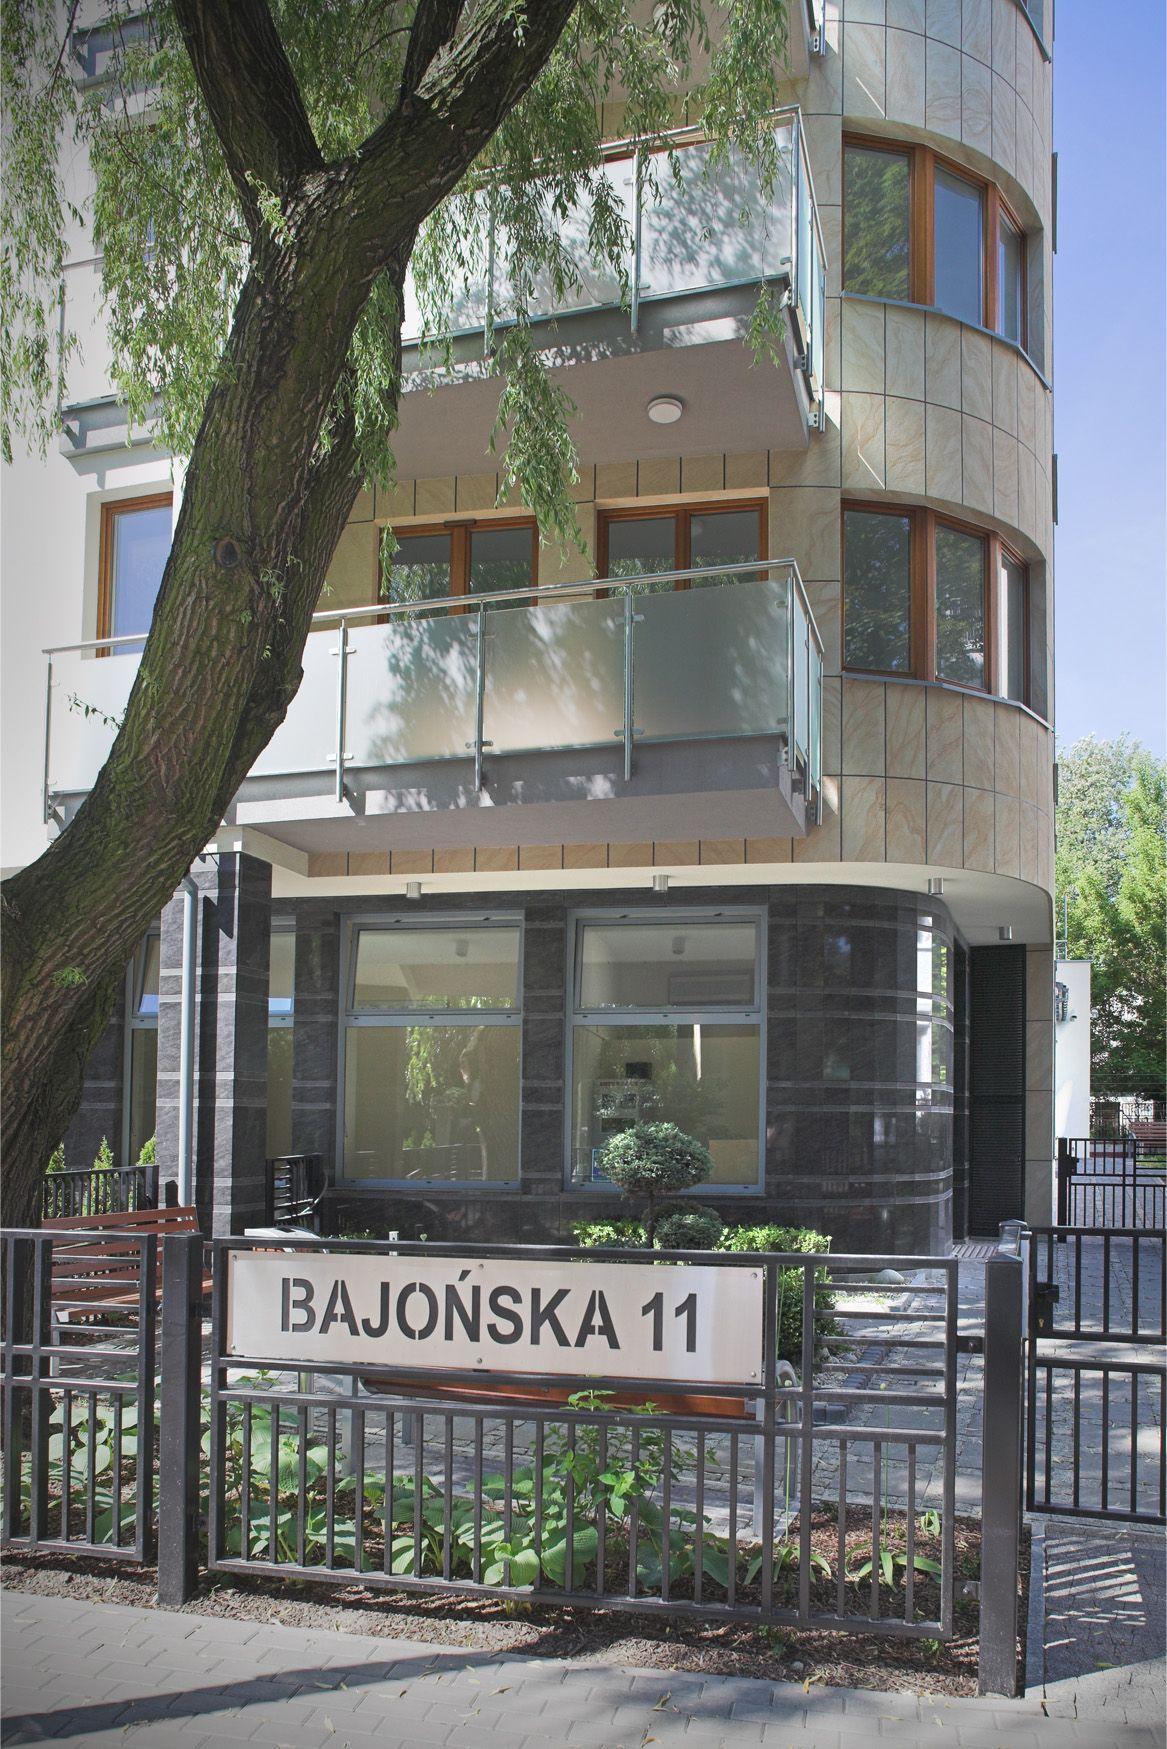 Tynkbud Bajonska